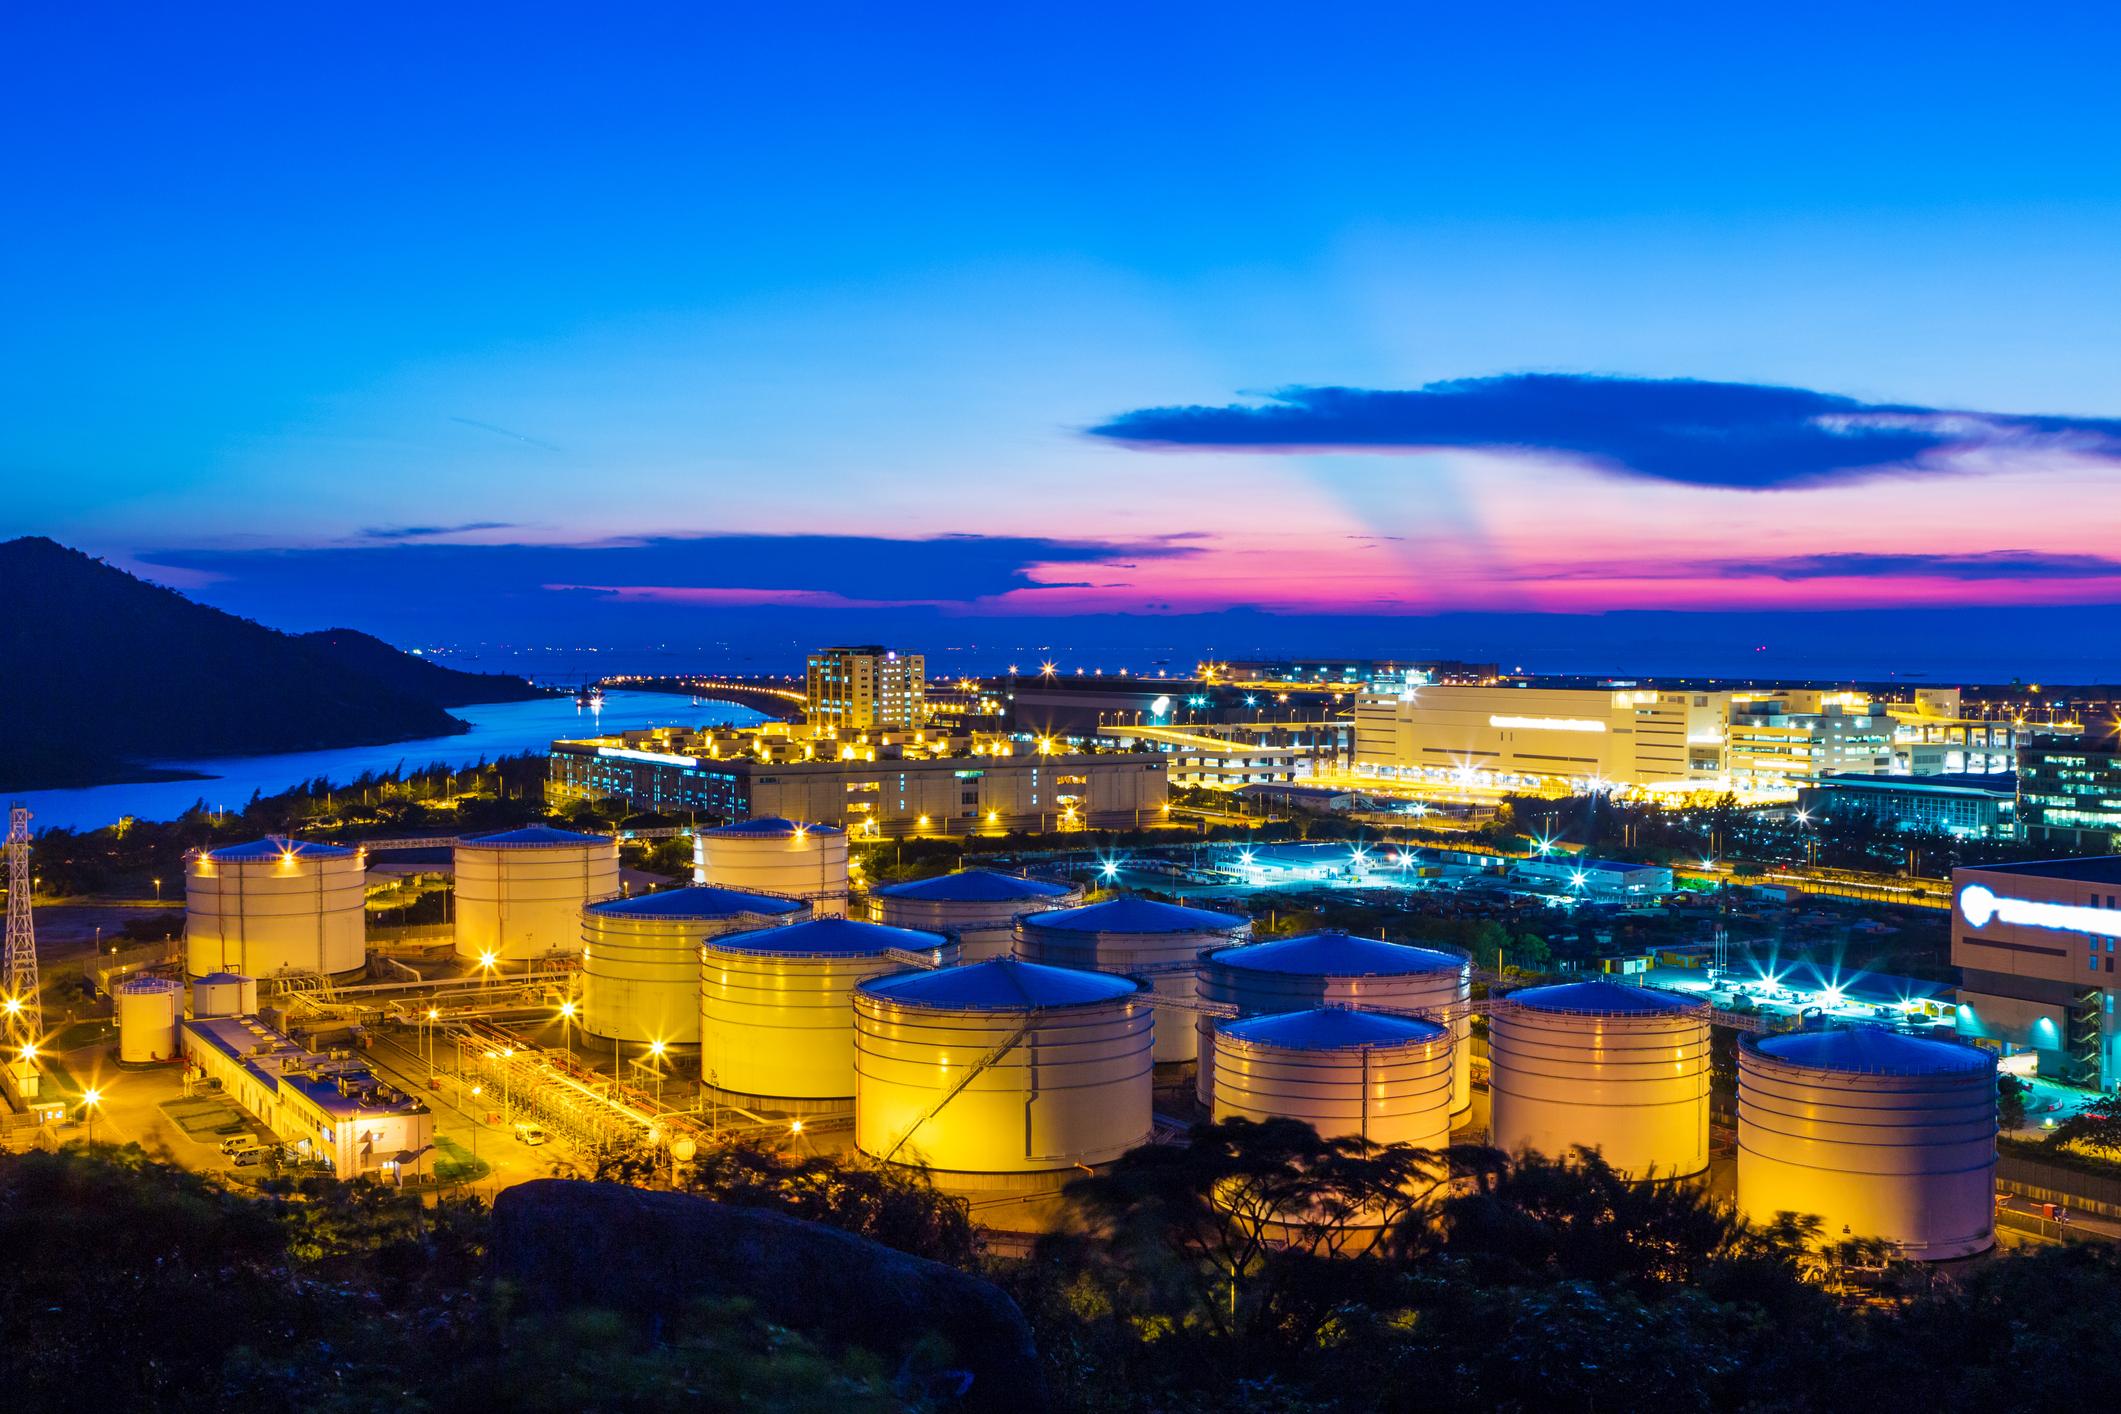 Oil storage tanks at twilight.